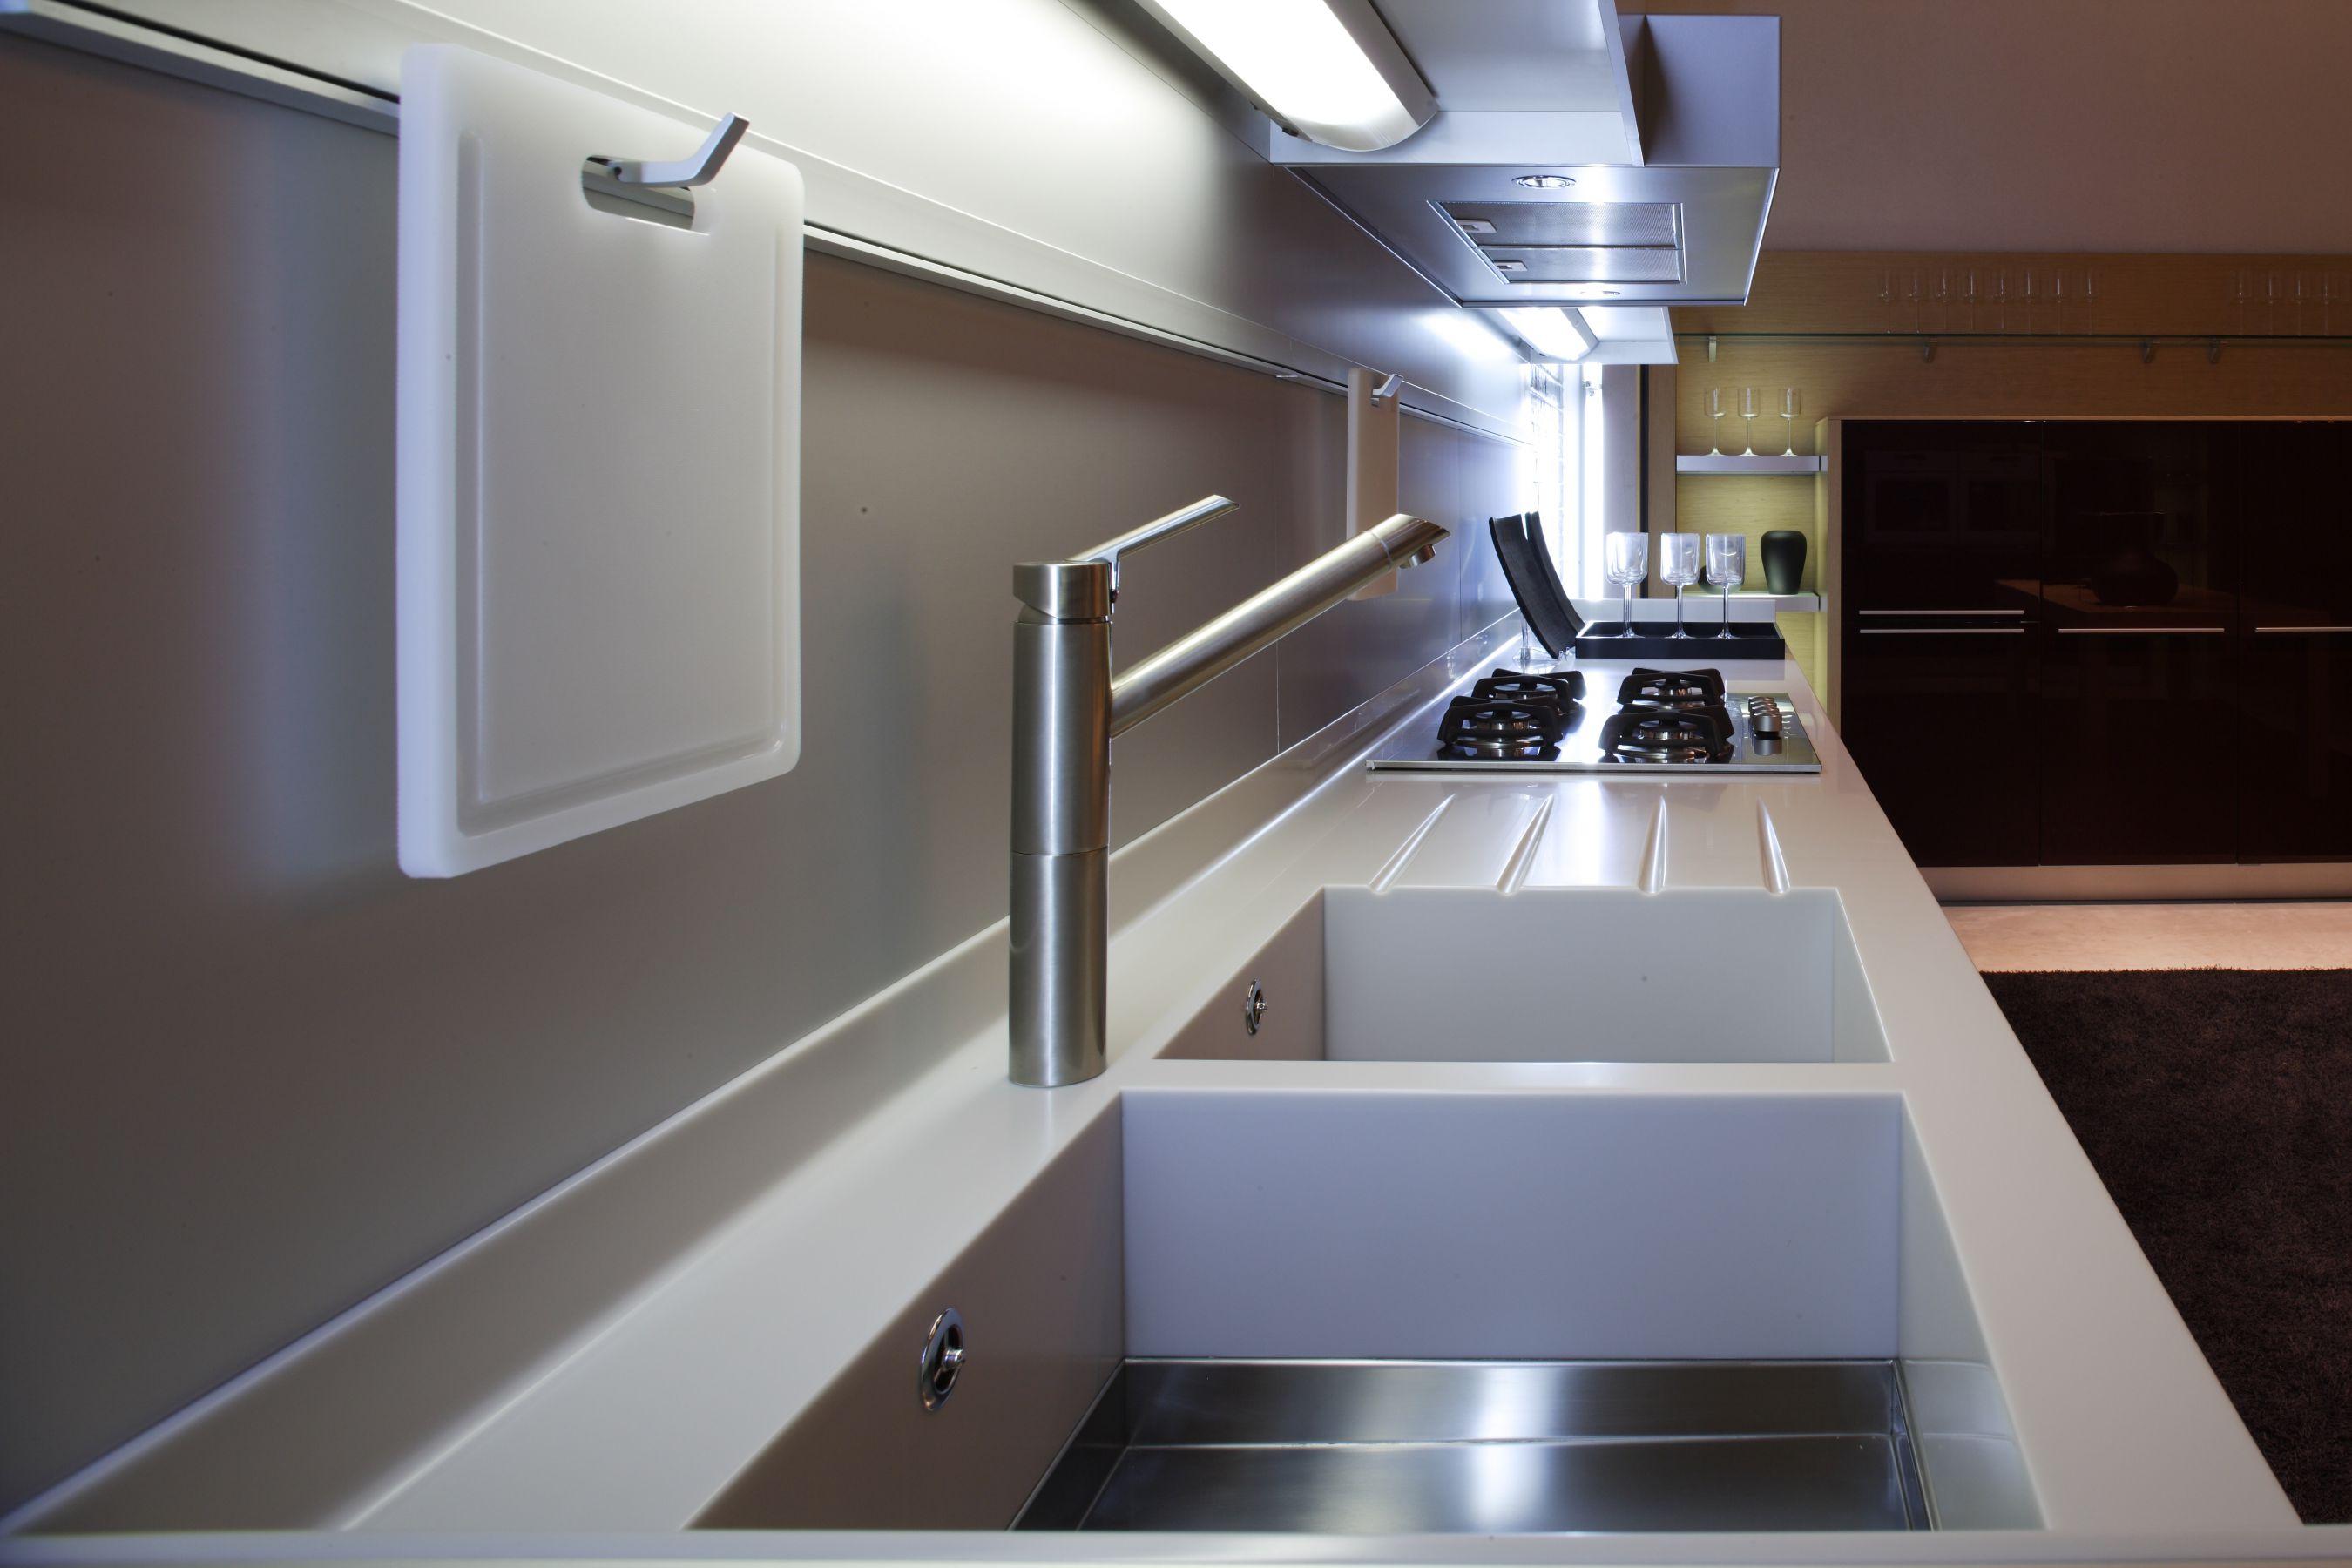 Piani cucina micunco stone design - Piani cucina materiali ...